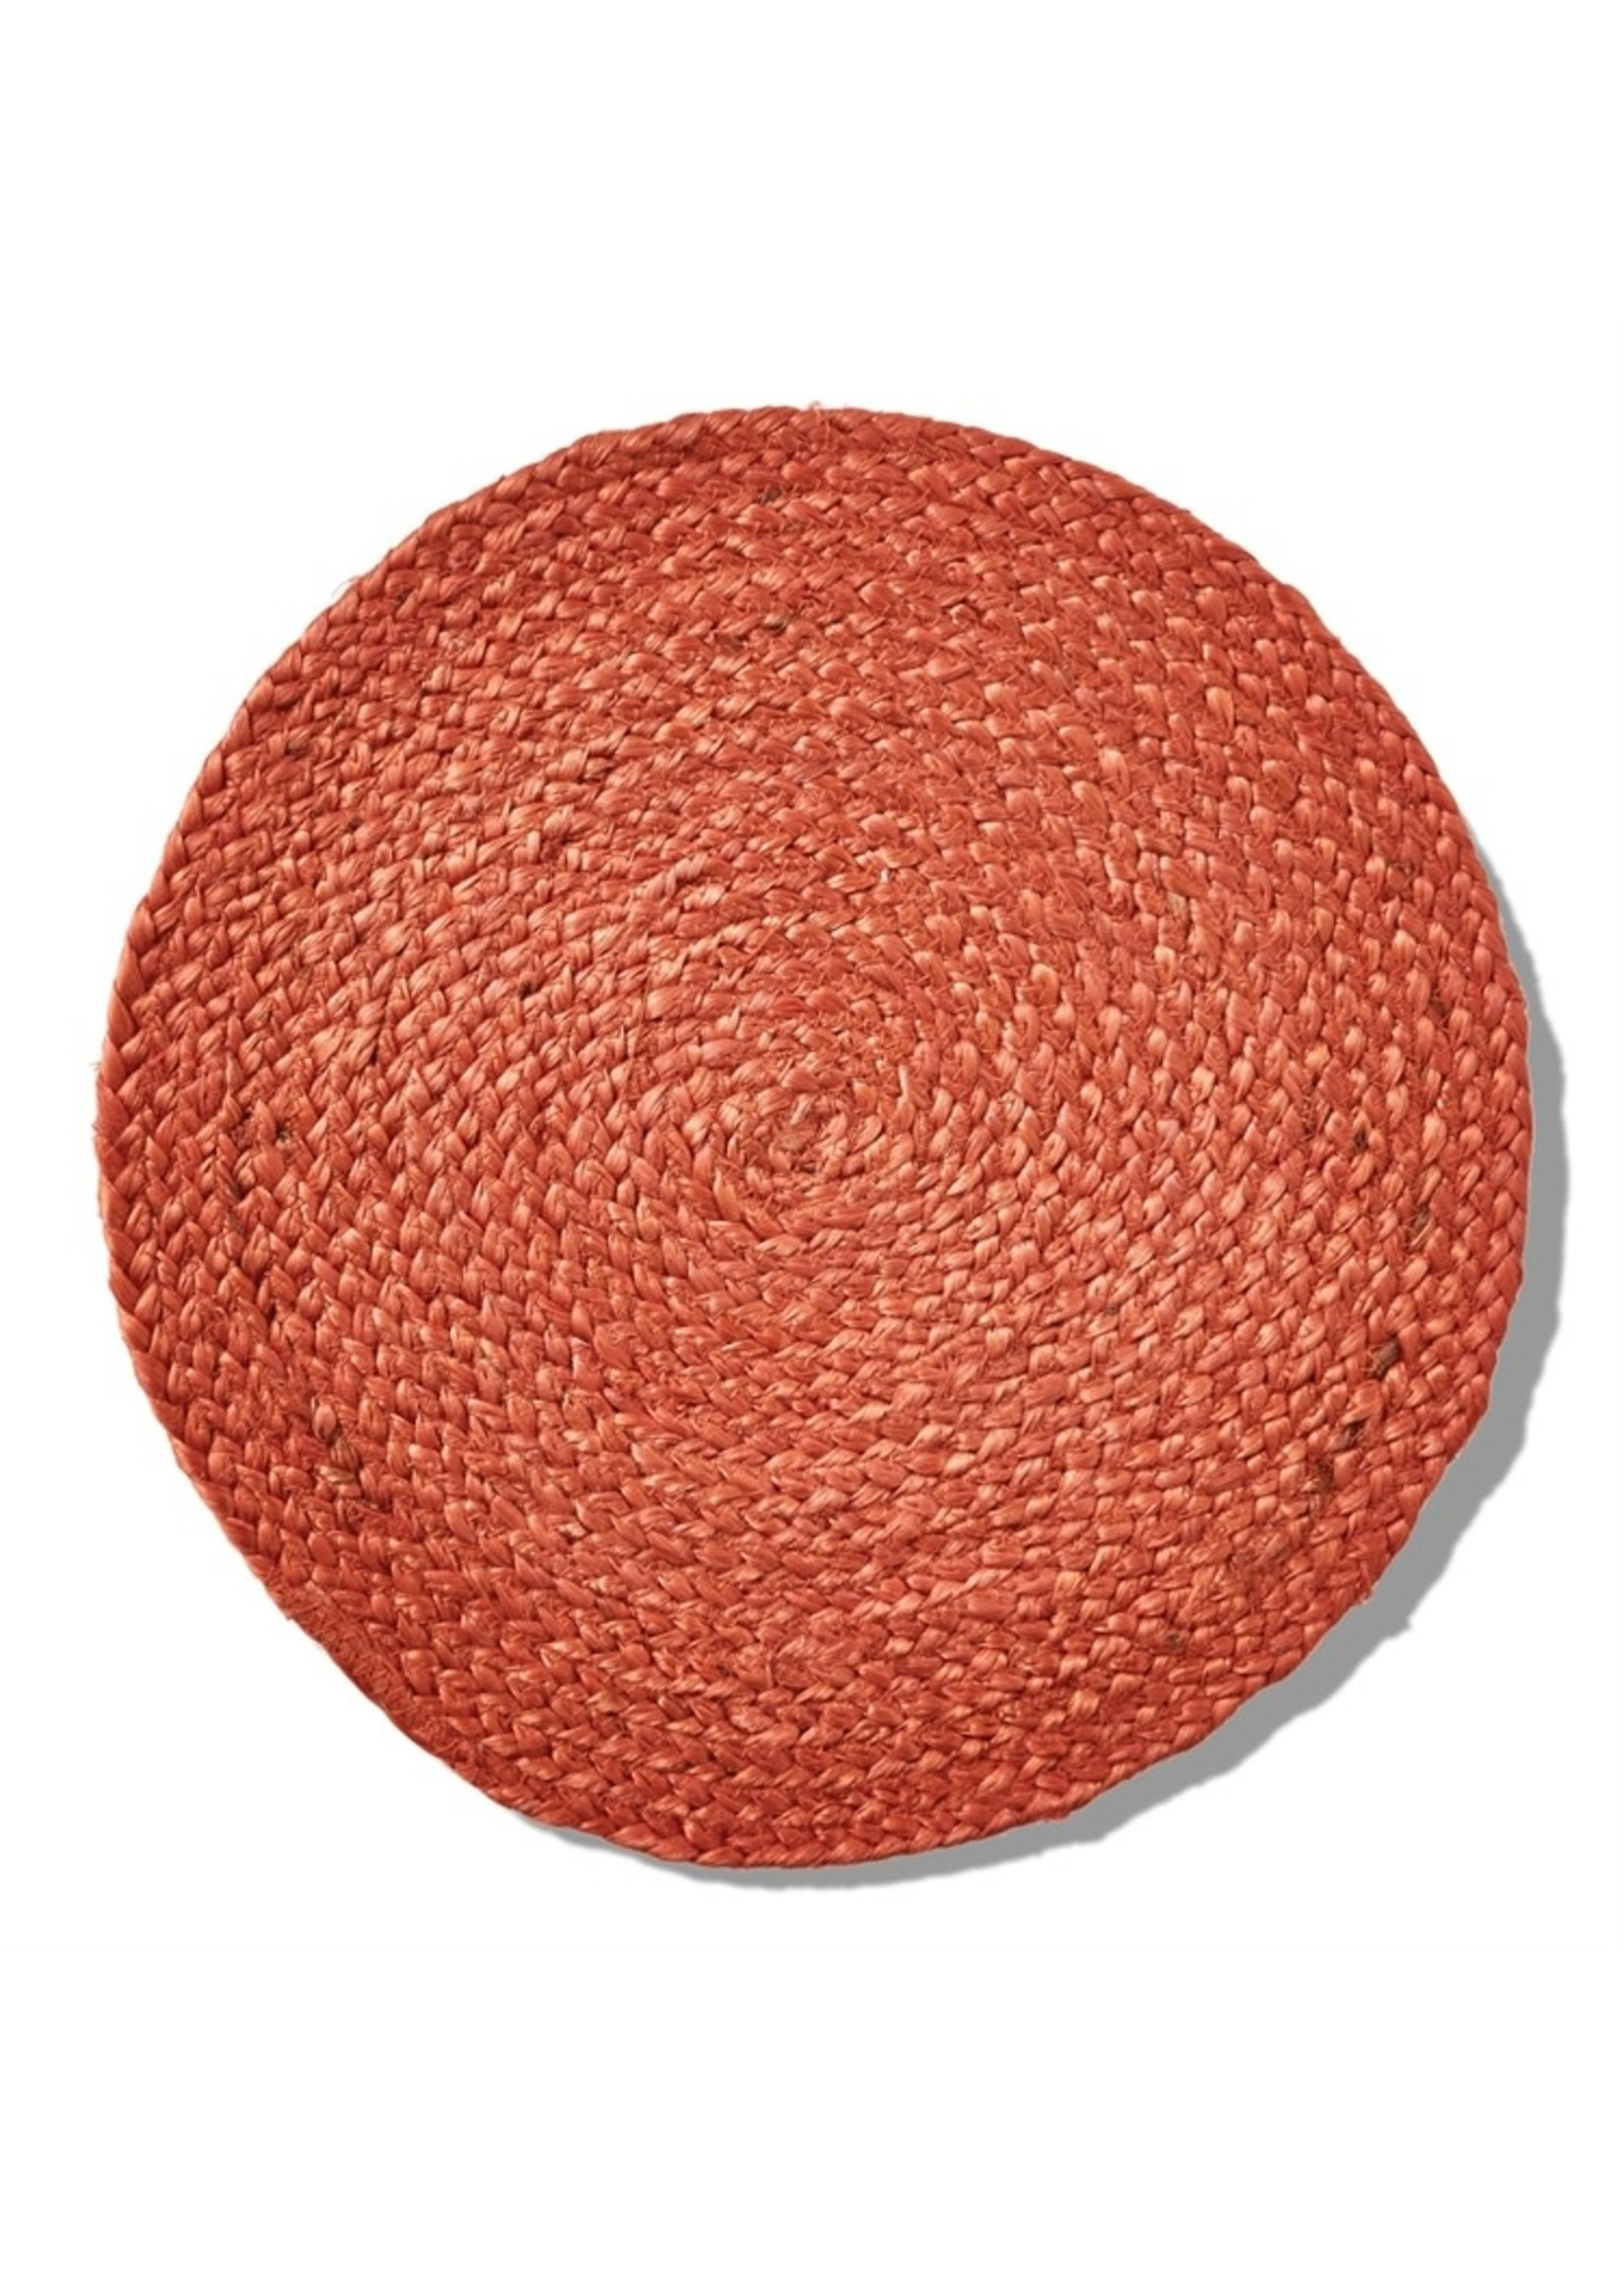 Tag Hemp Braided Platemat - Terracotta